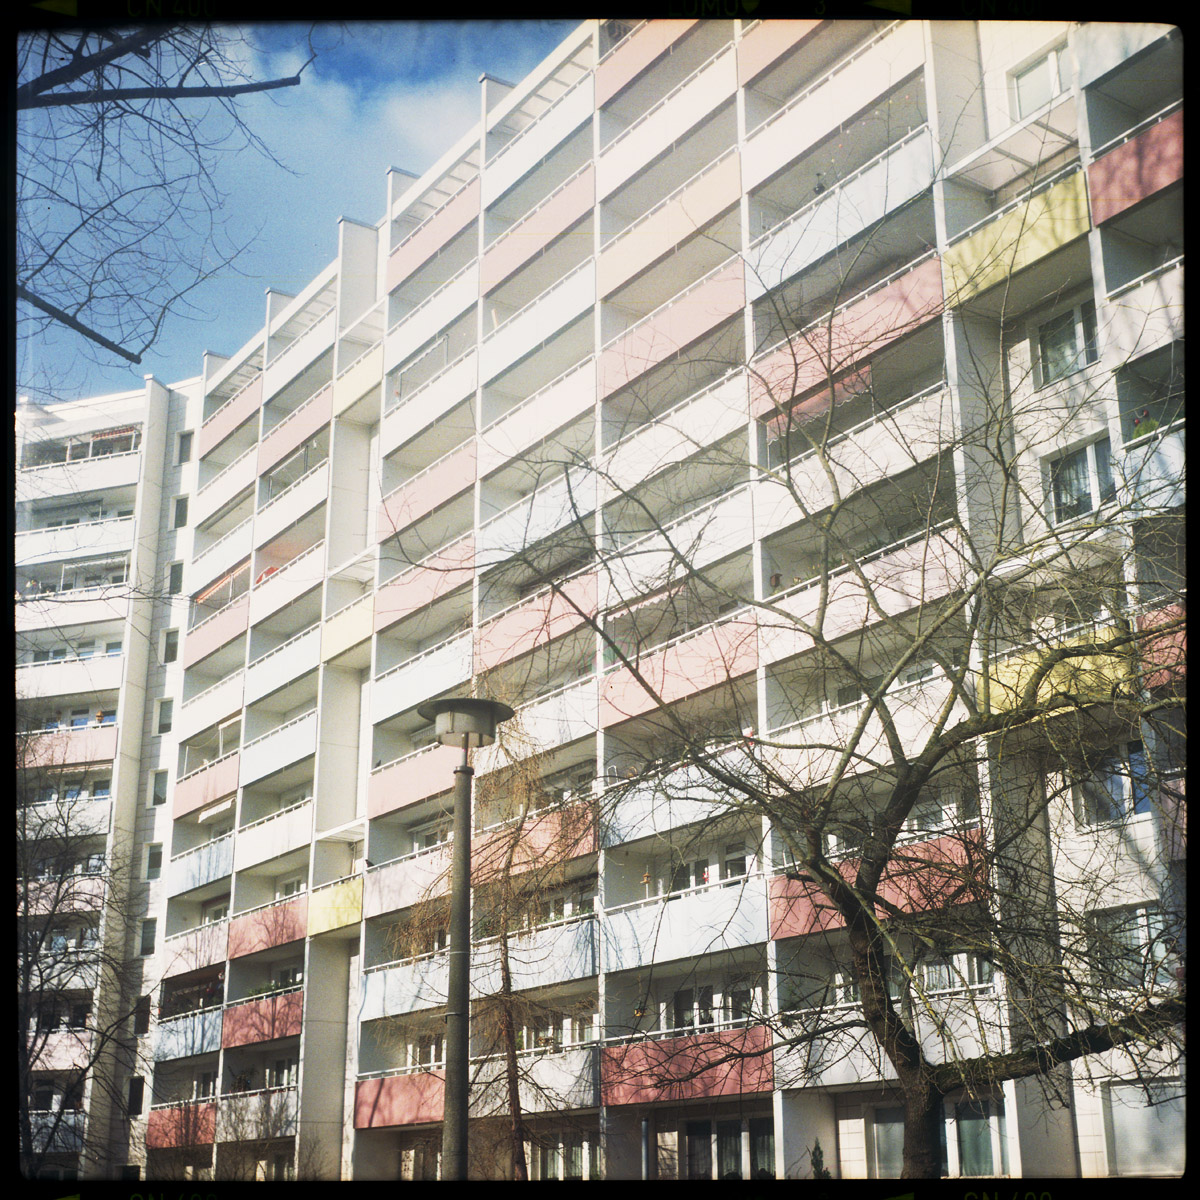 sightseeing, plattenbau, lichtenberg, berlin - Pieces of Berlin - Book and Blog